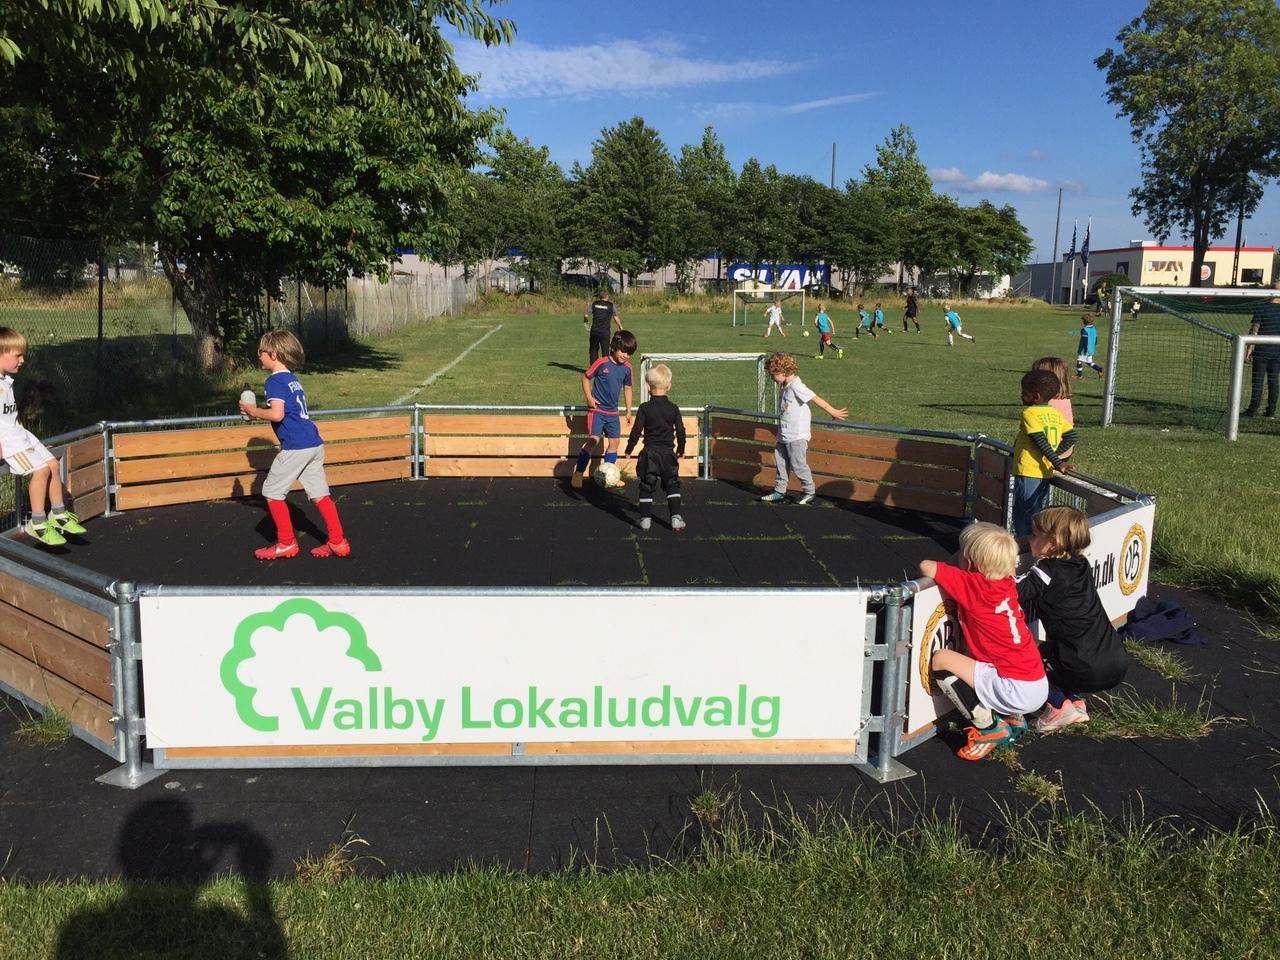 Valby Lokaludvalg Valby Boldklub